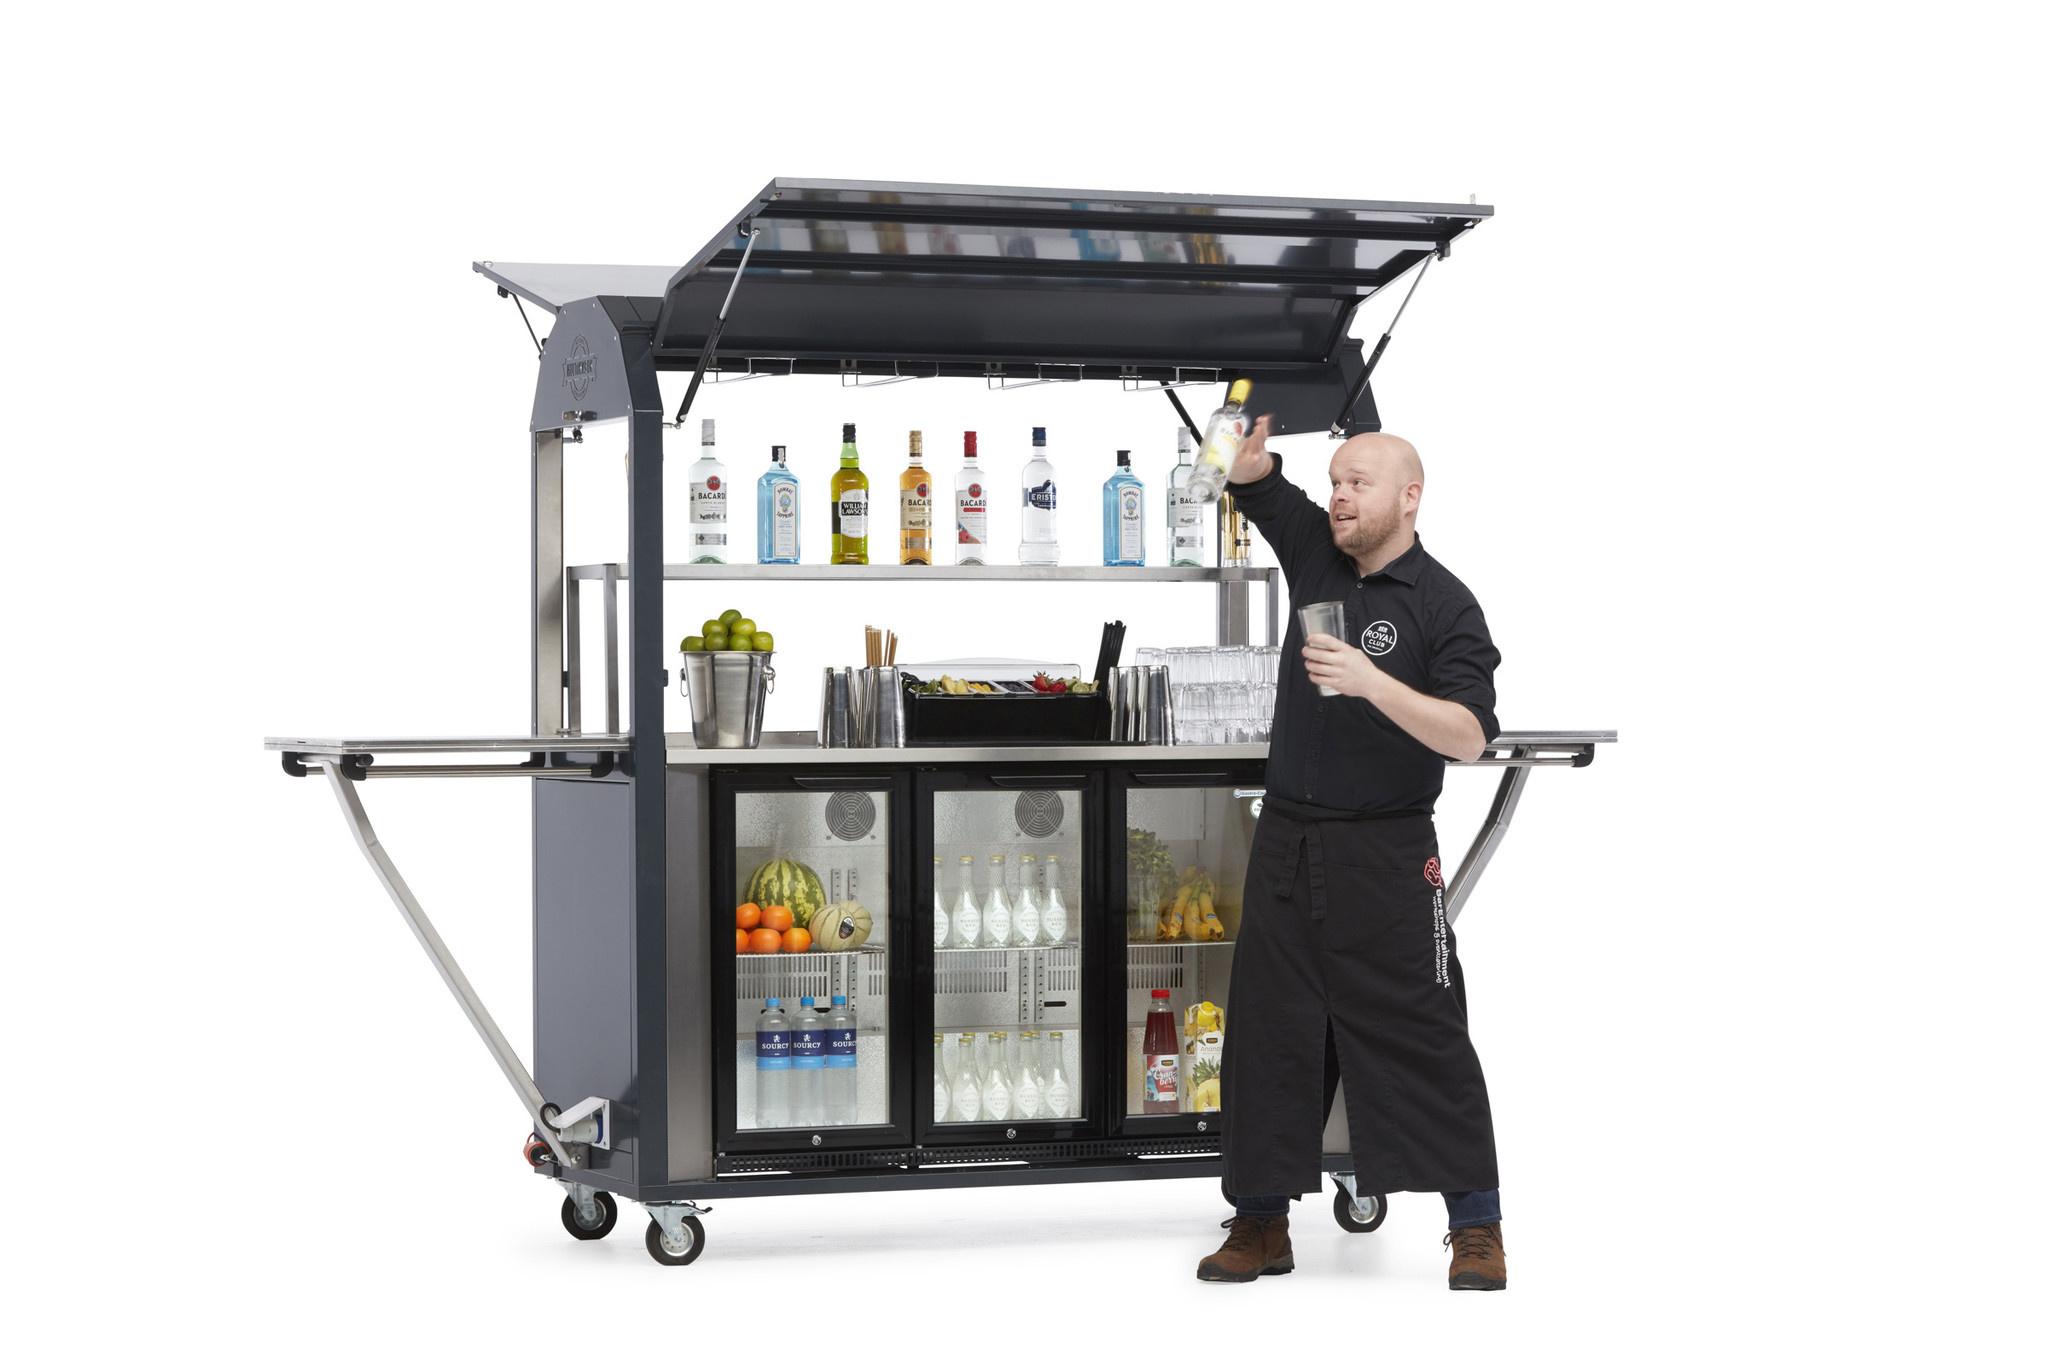 coolrolley bar foto 3